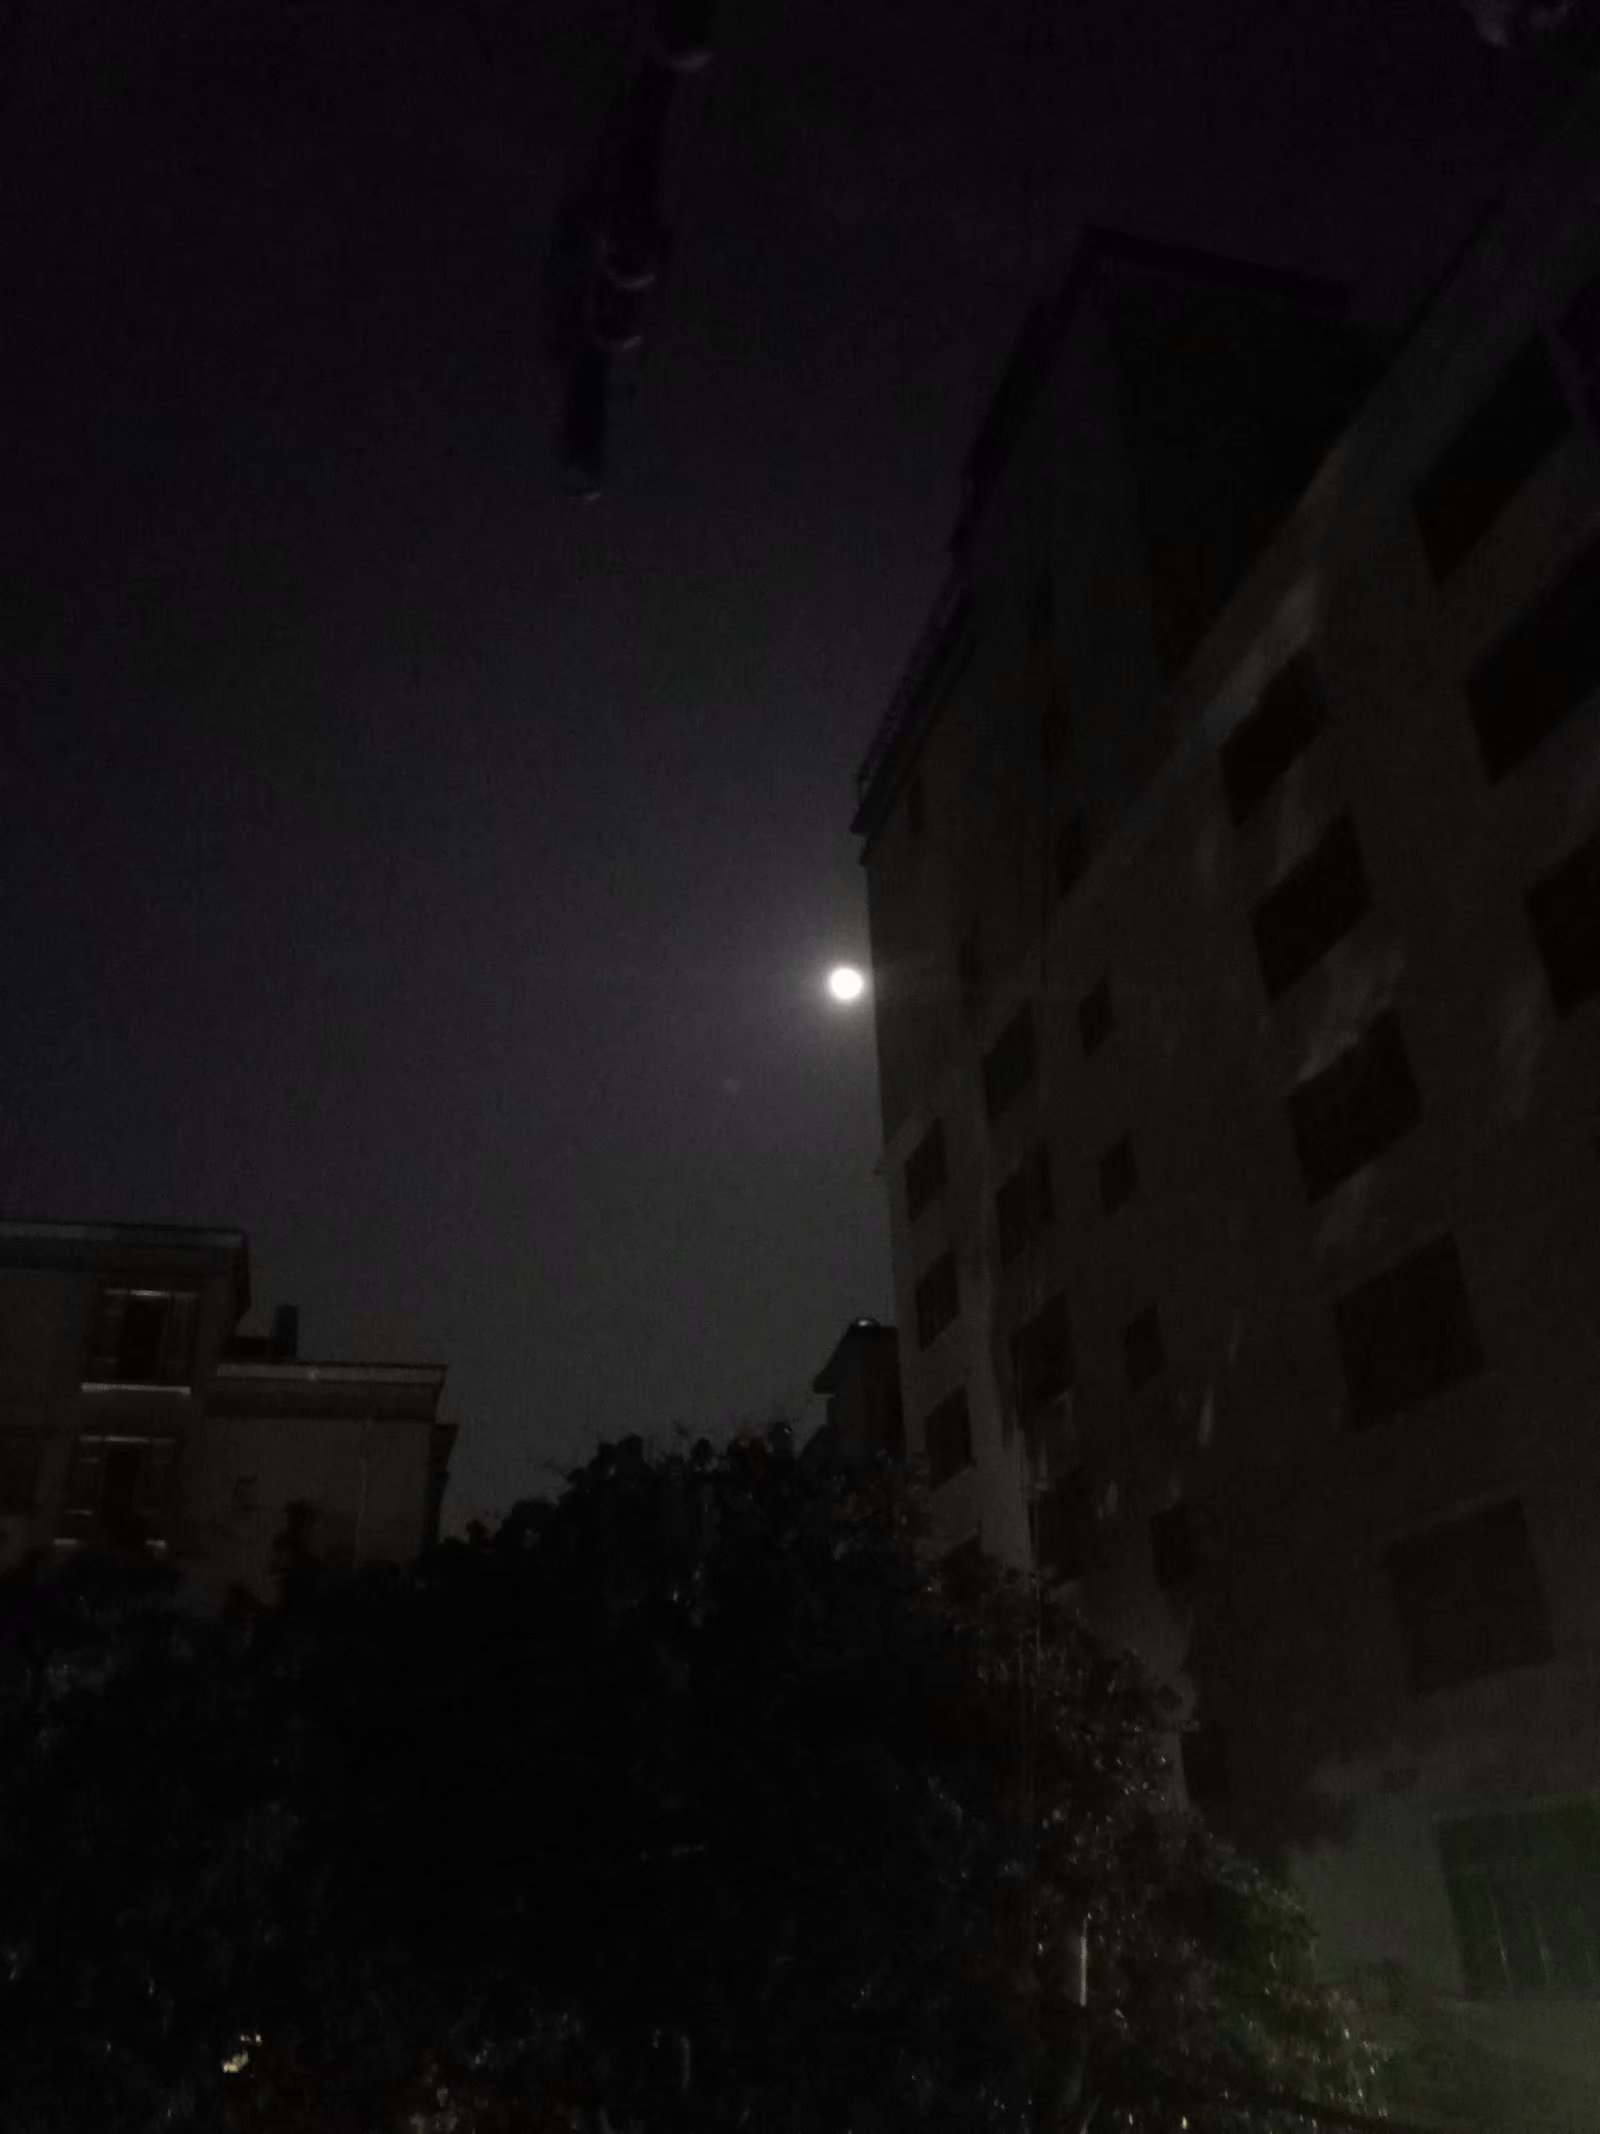 9.25 (1).jpg 十五的月亮十六圆 一句话